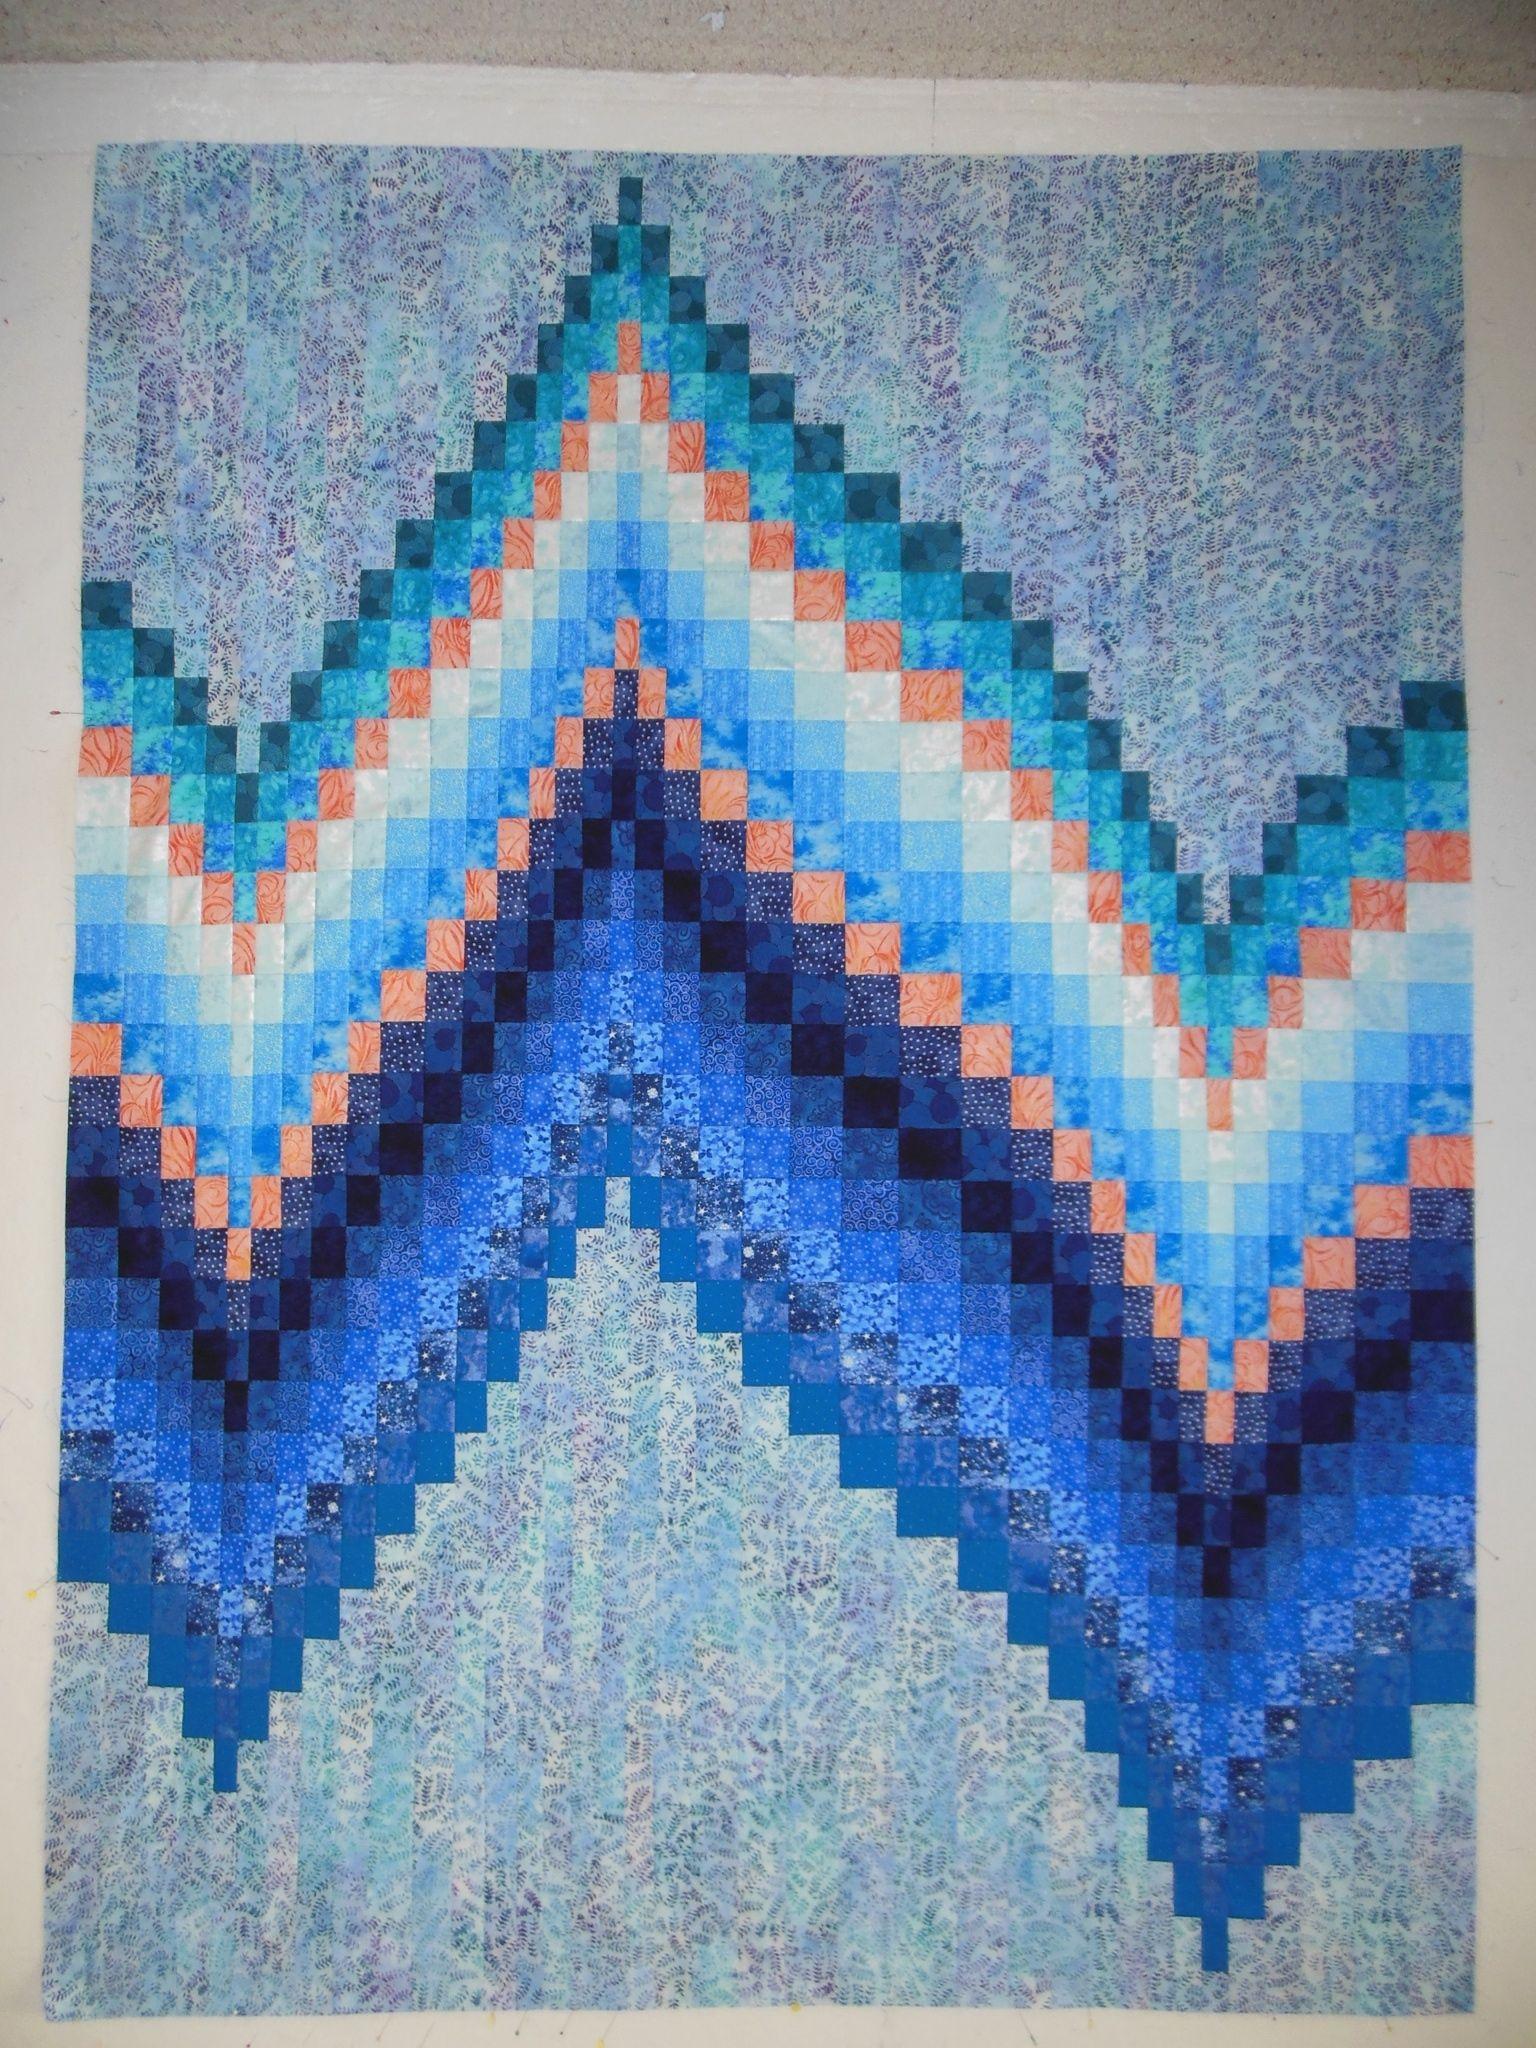 Polar Bear bargello quilt kit at Northern Threads | Bargello ... : bargello quilt kits - Adamdwight.com